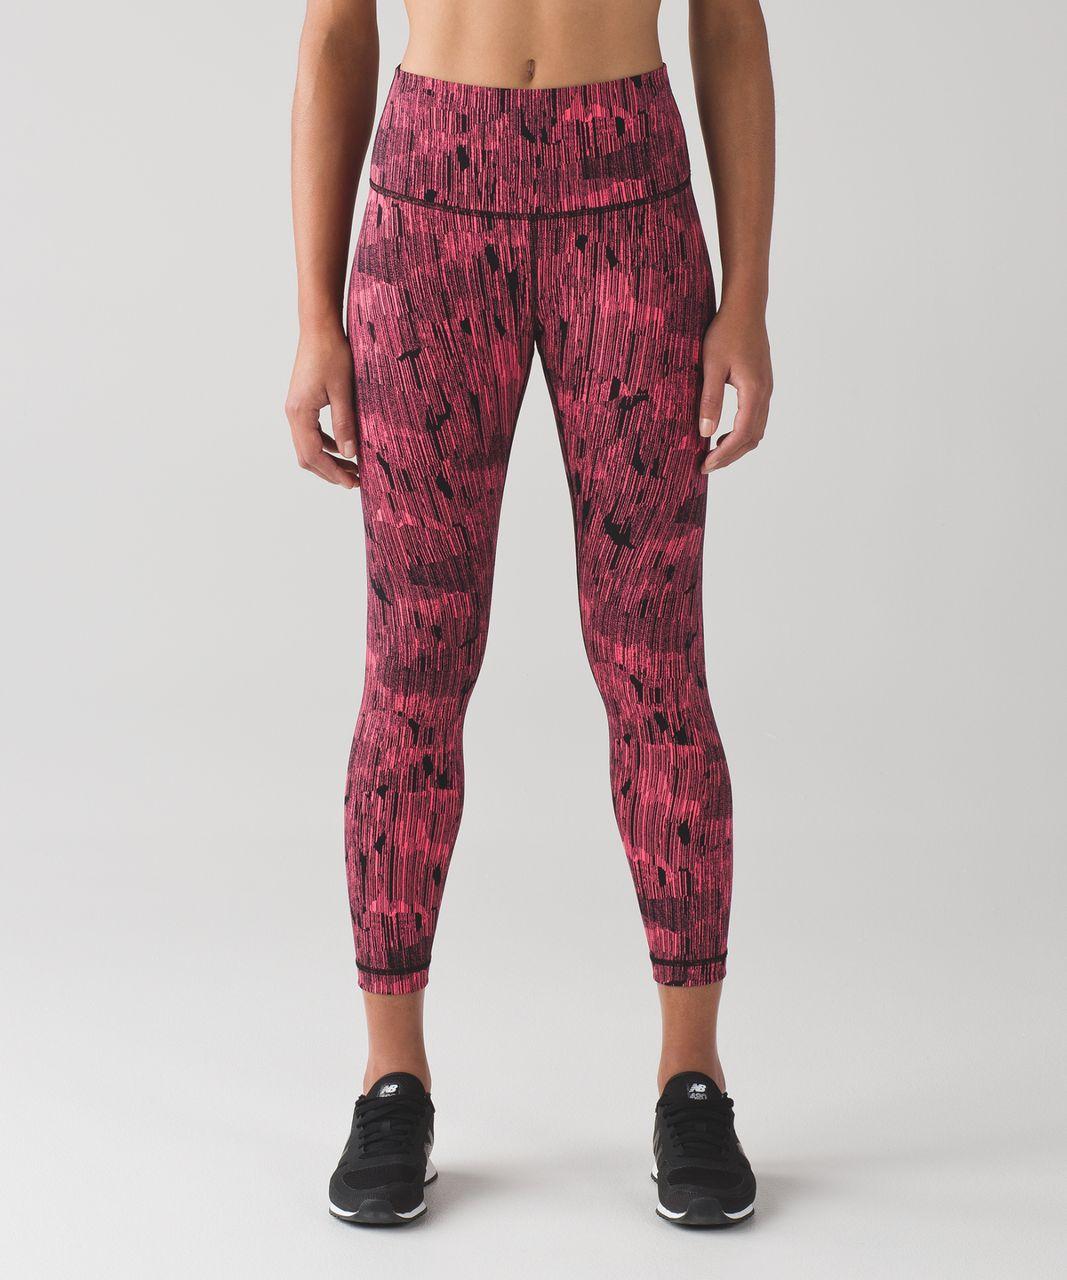 Lululemon High Times Pant - Down Pour Electric Coral Black